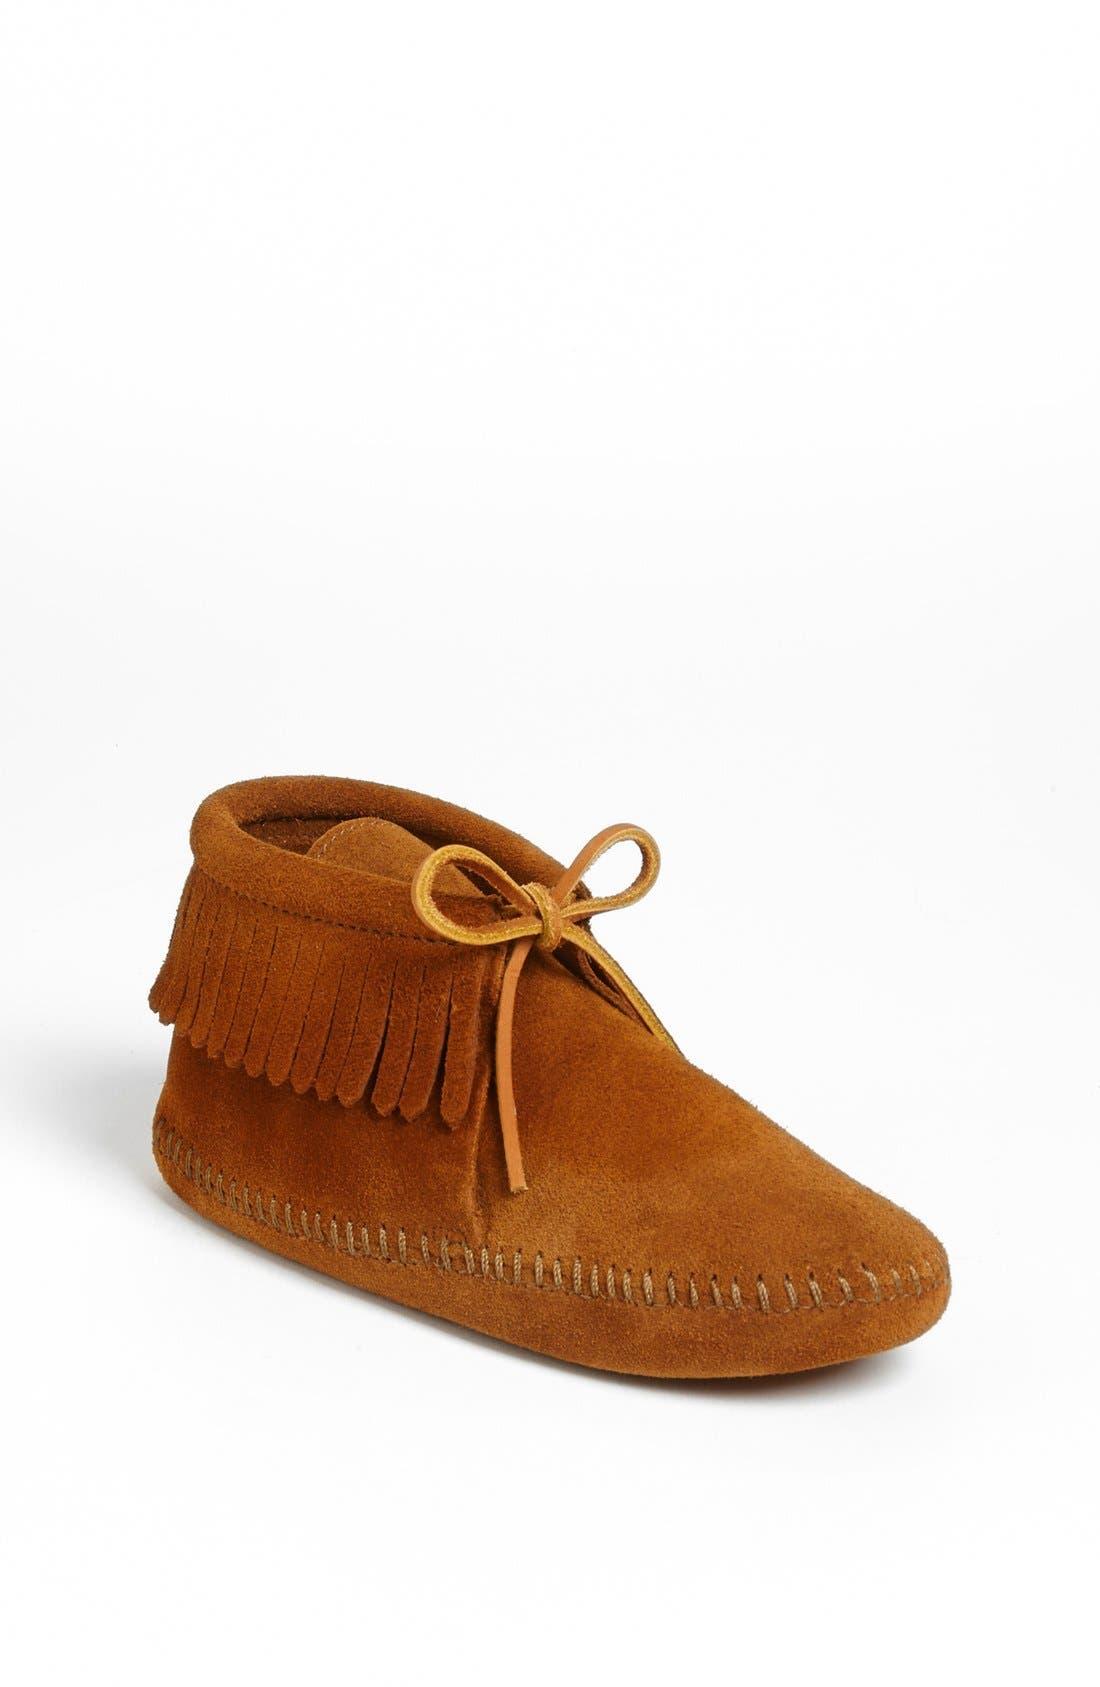 'Classic Fringe' Boot,                         Main,                         color,